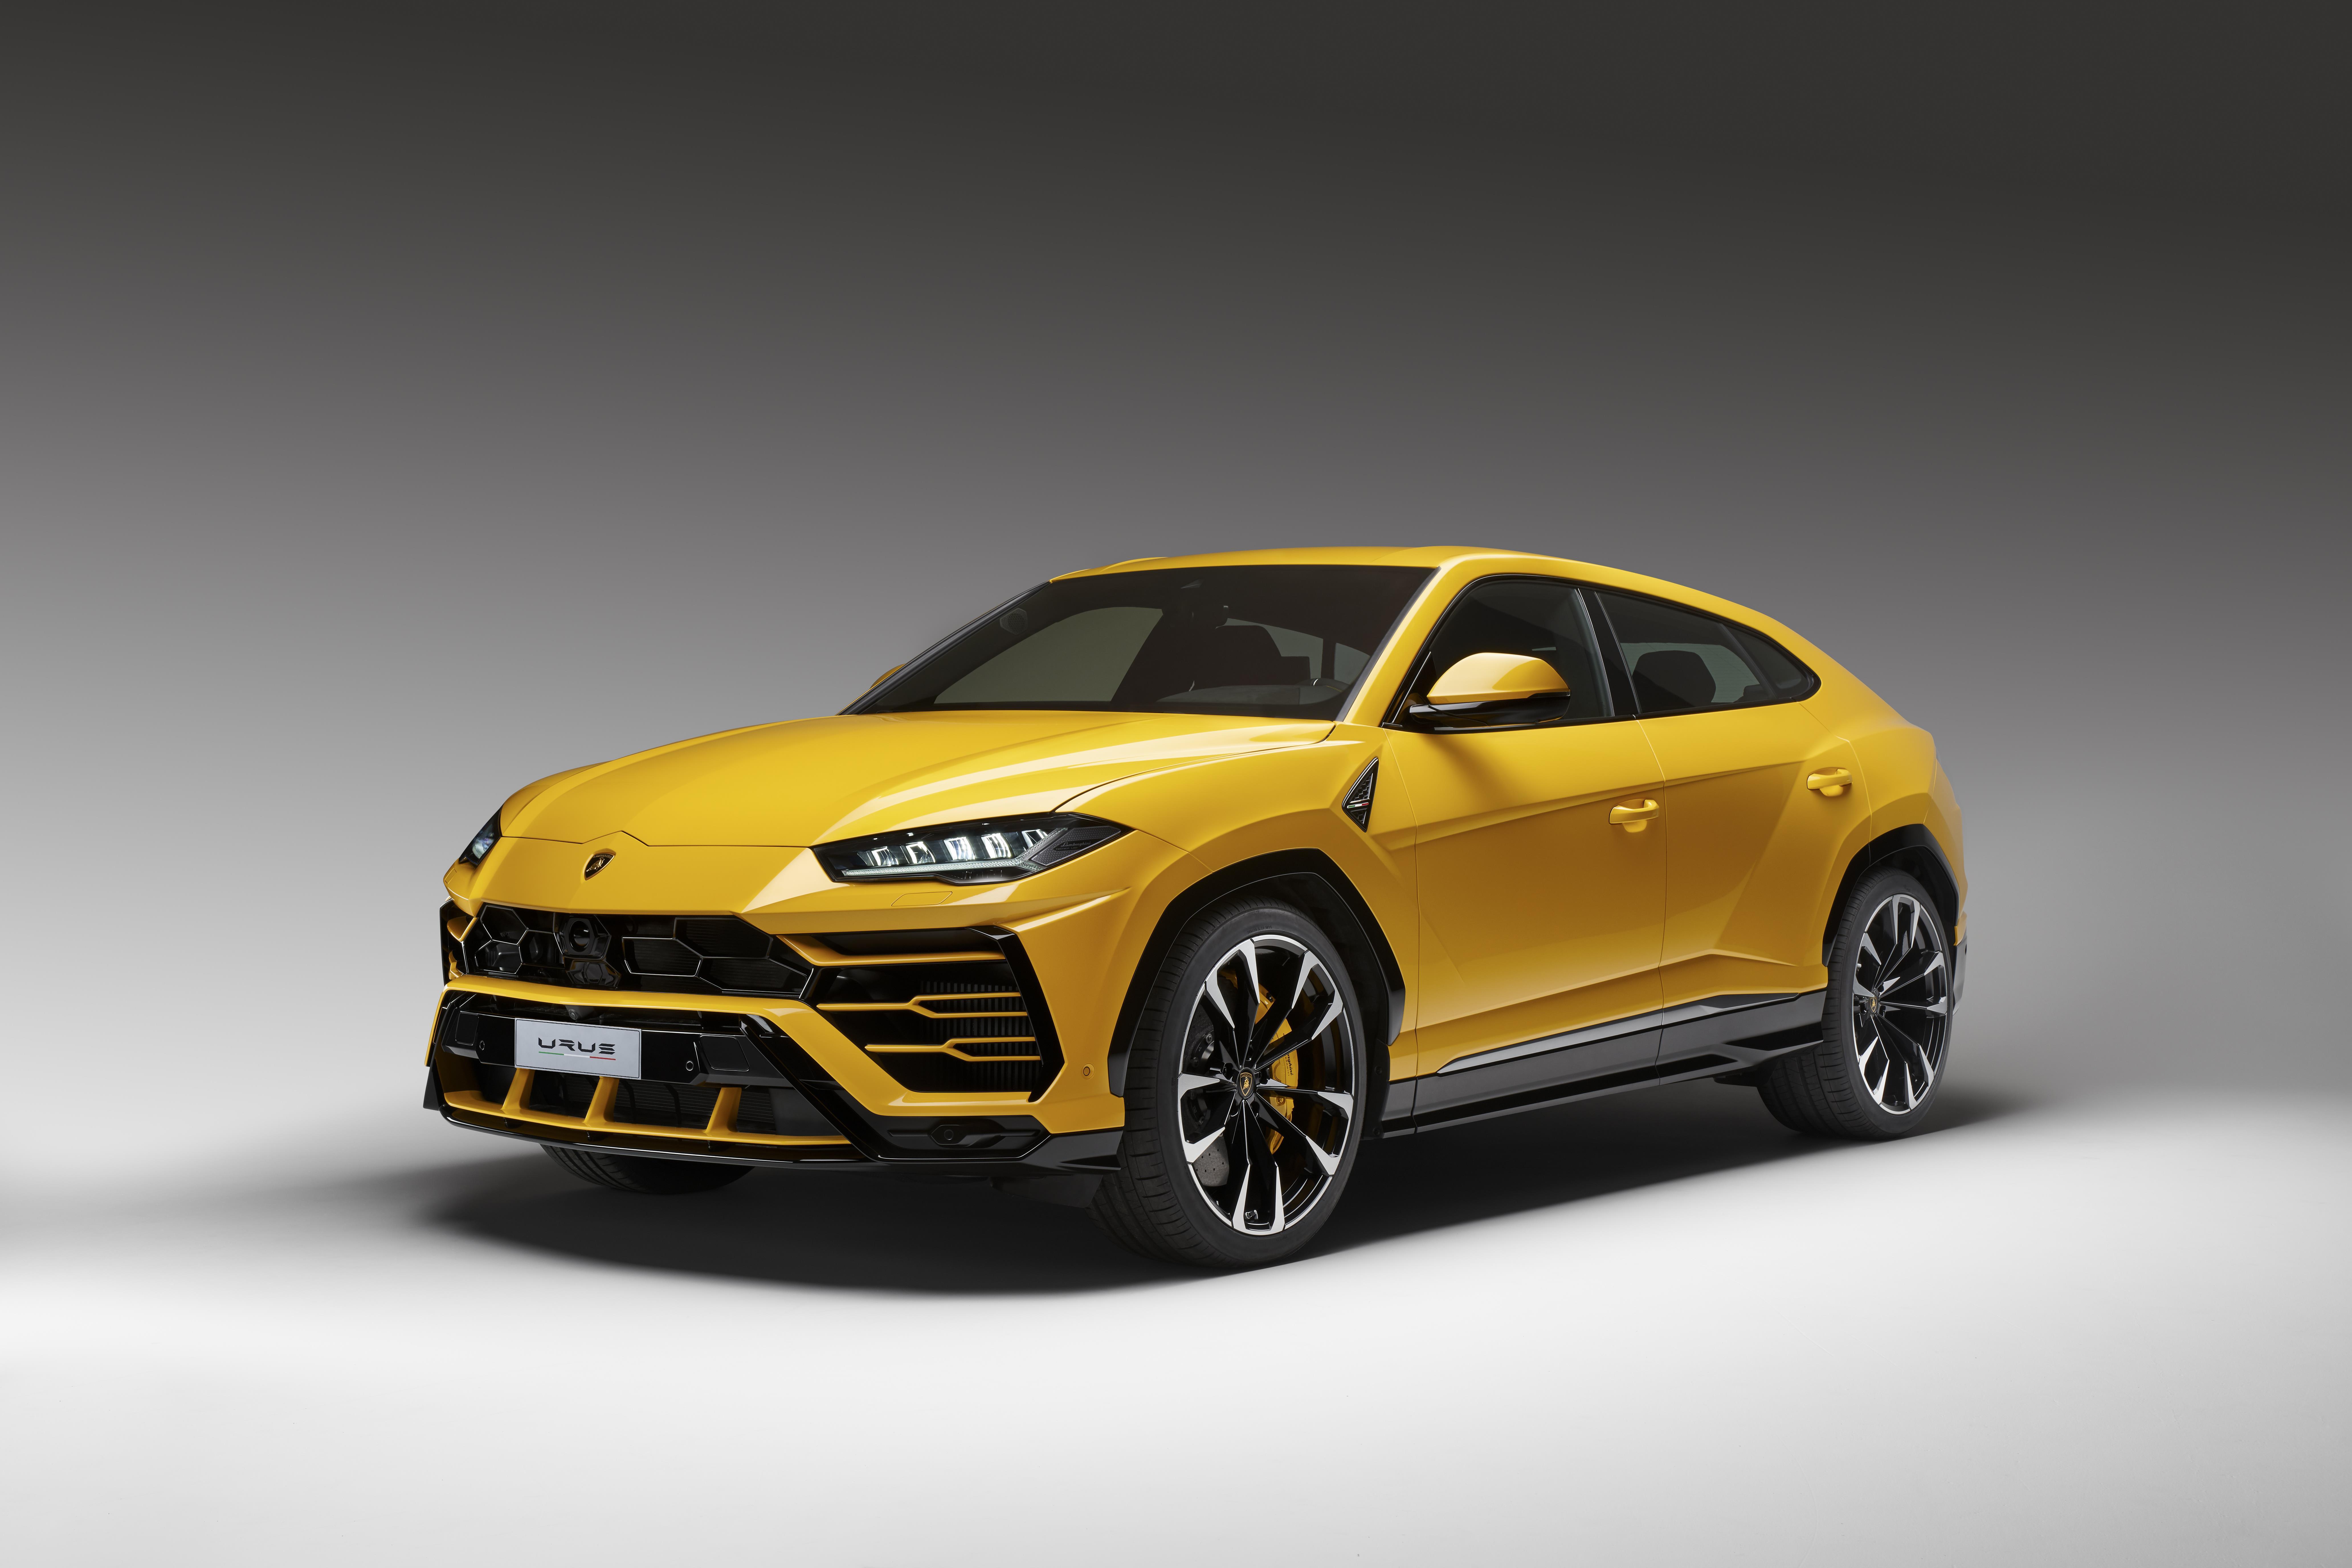 Luxury car segment doesn't suffer from corona crisis